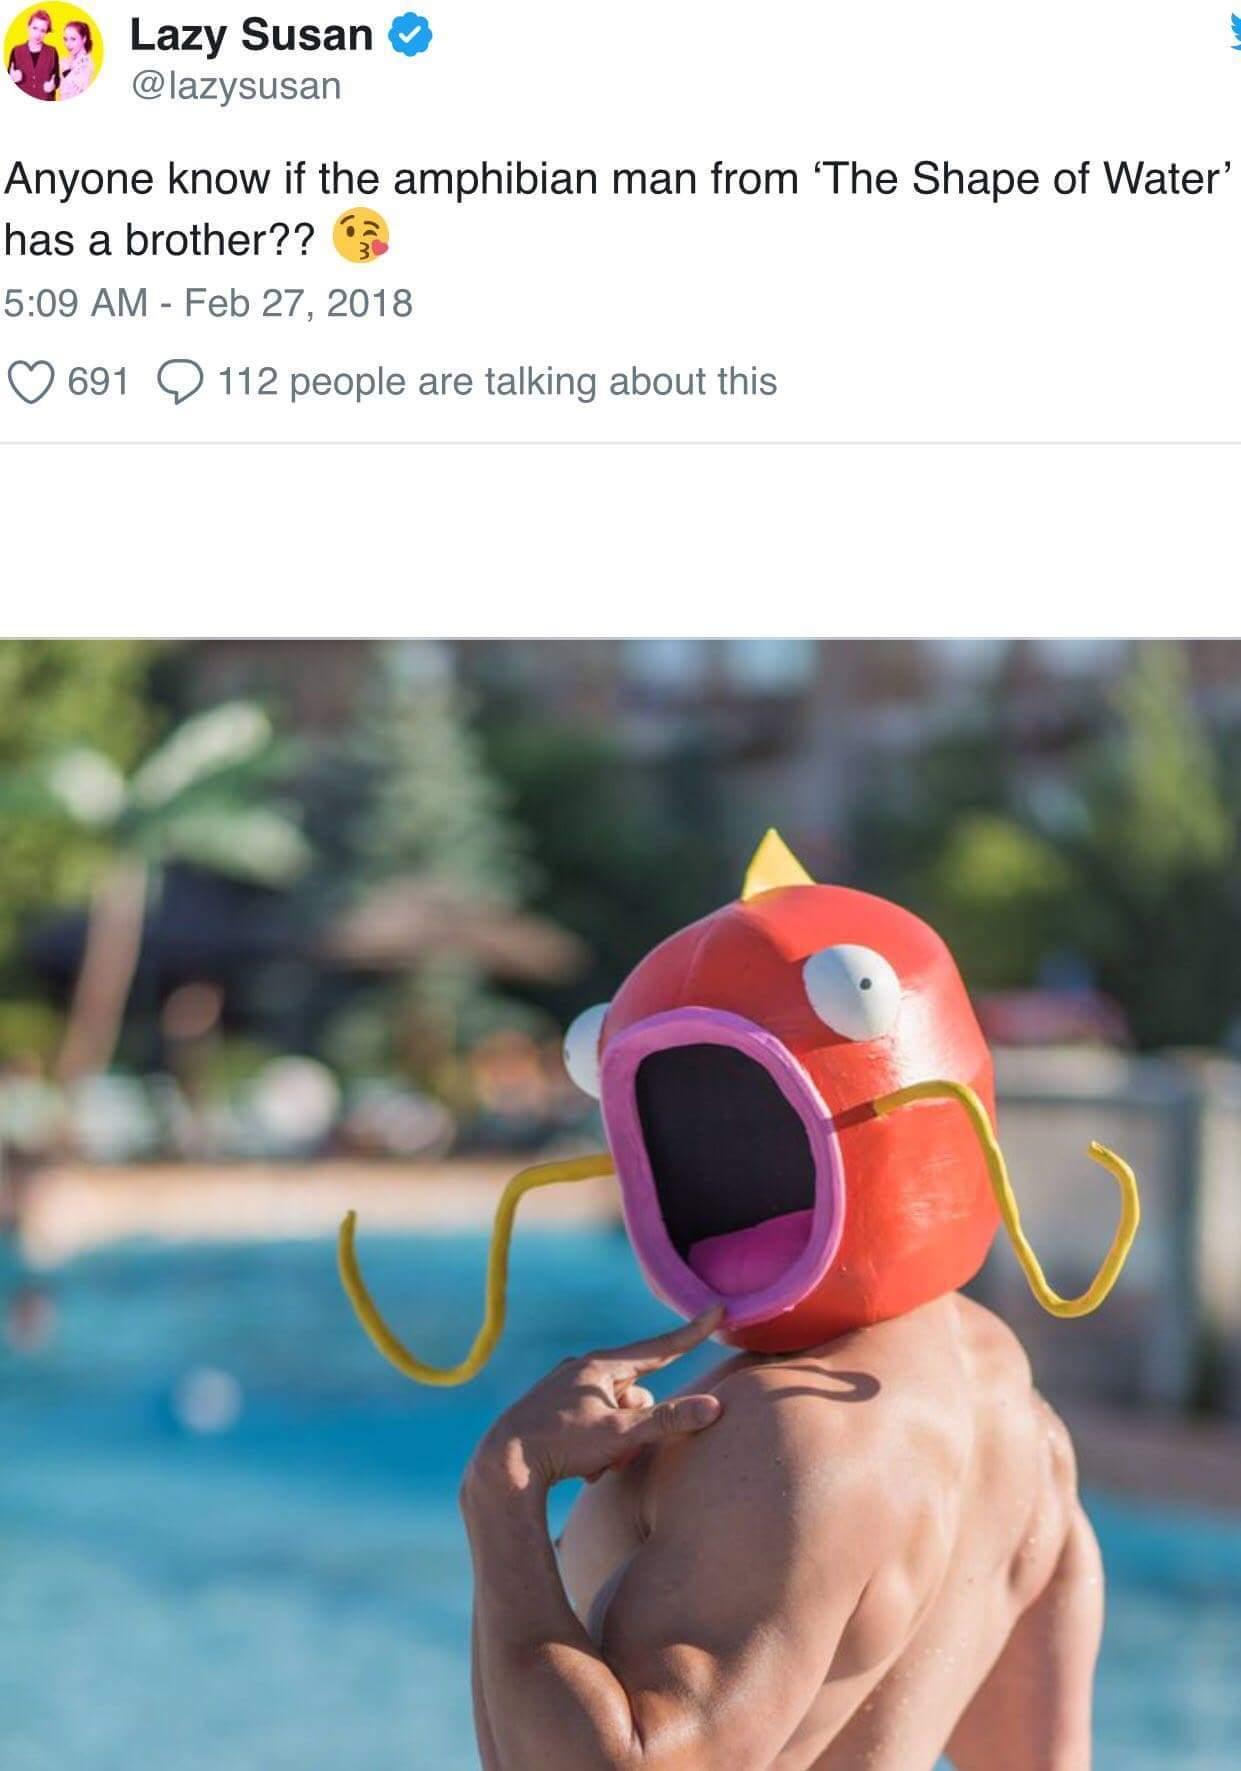 The fish banging movie - meme